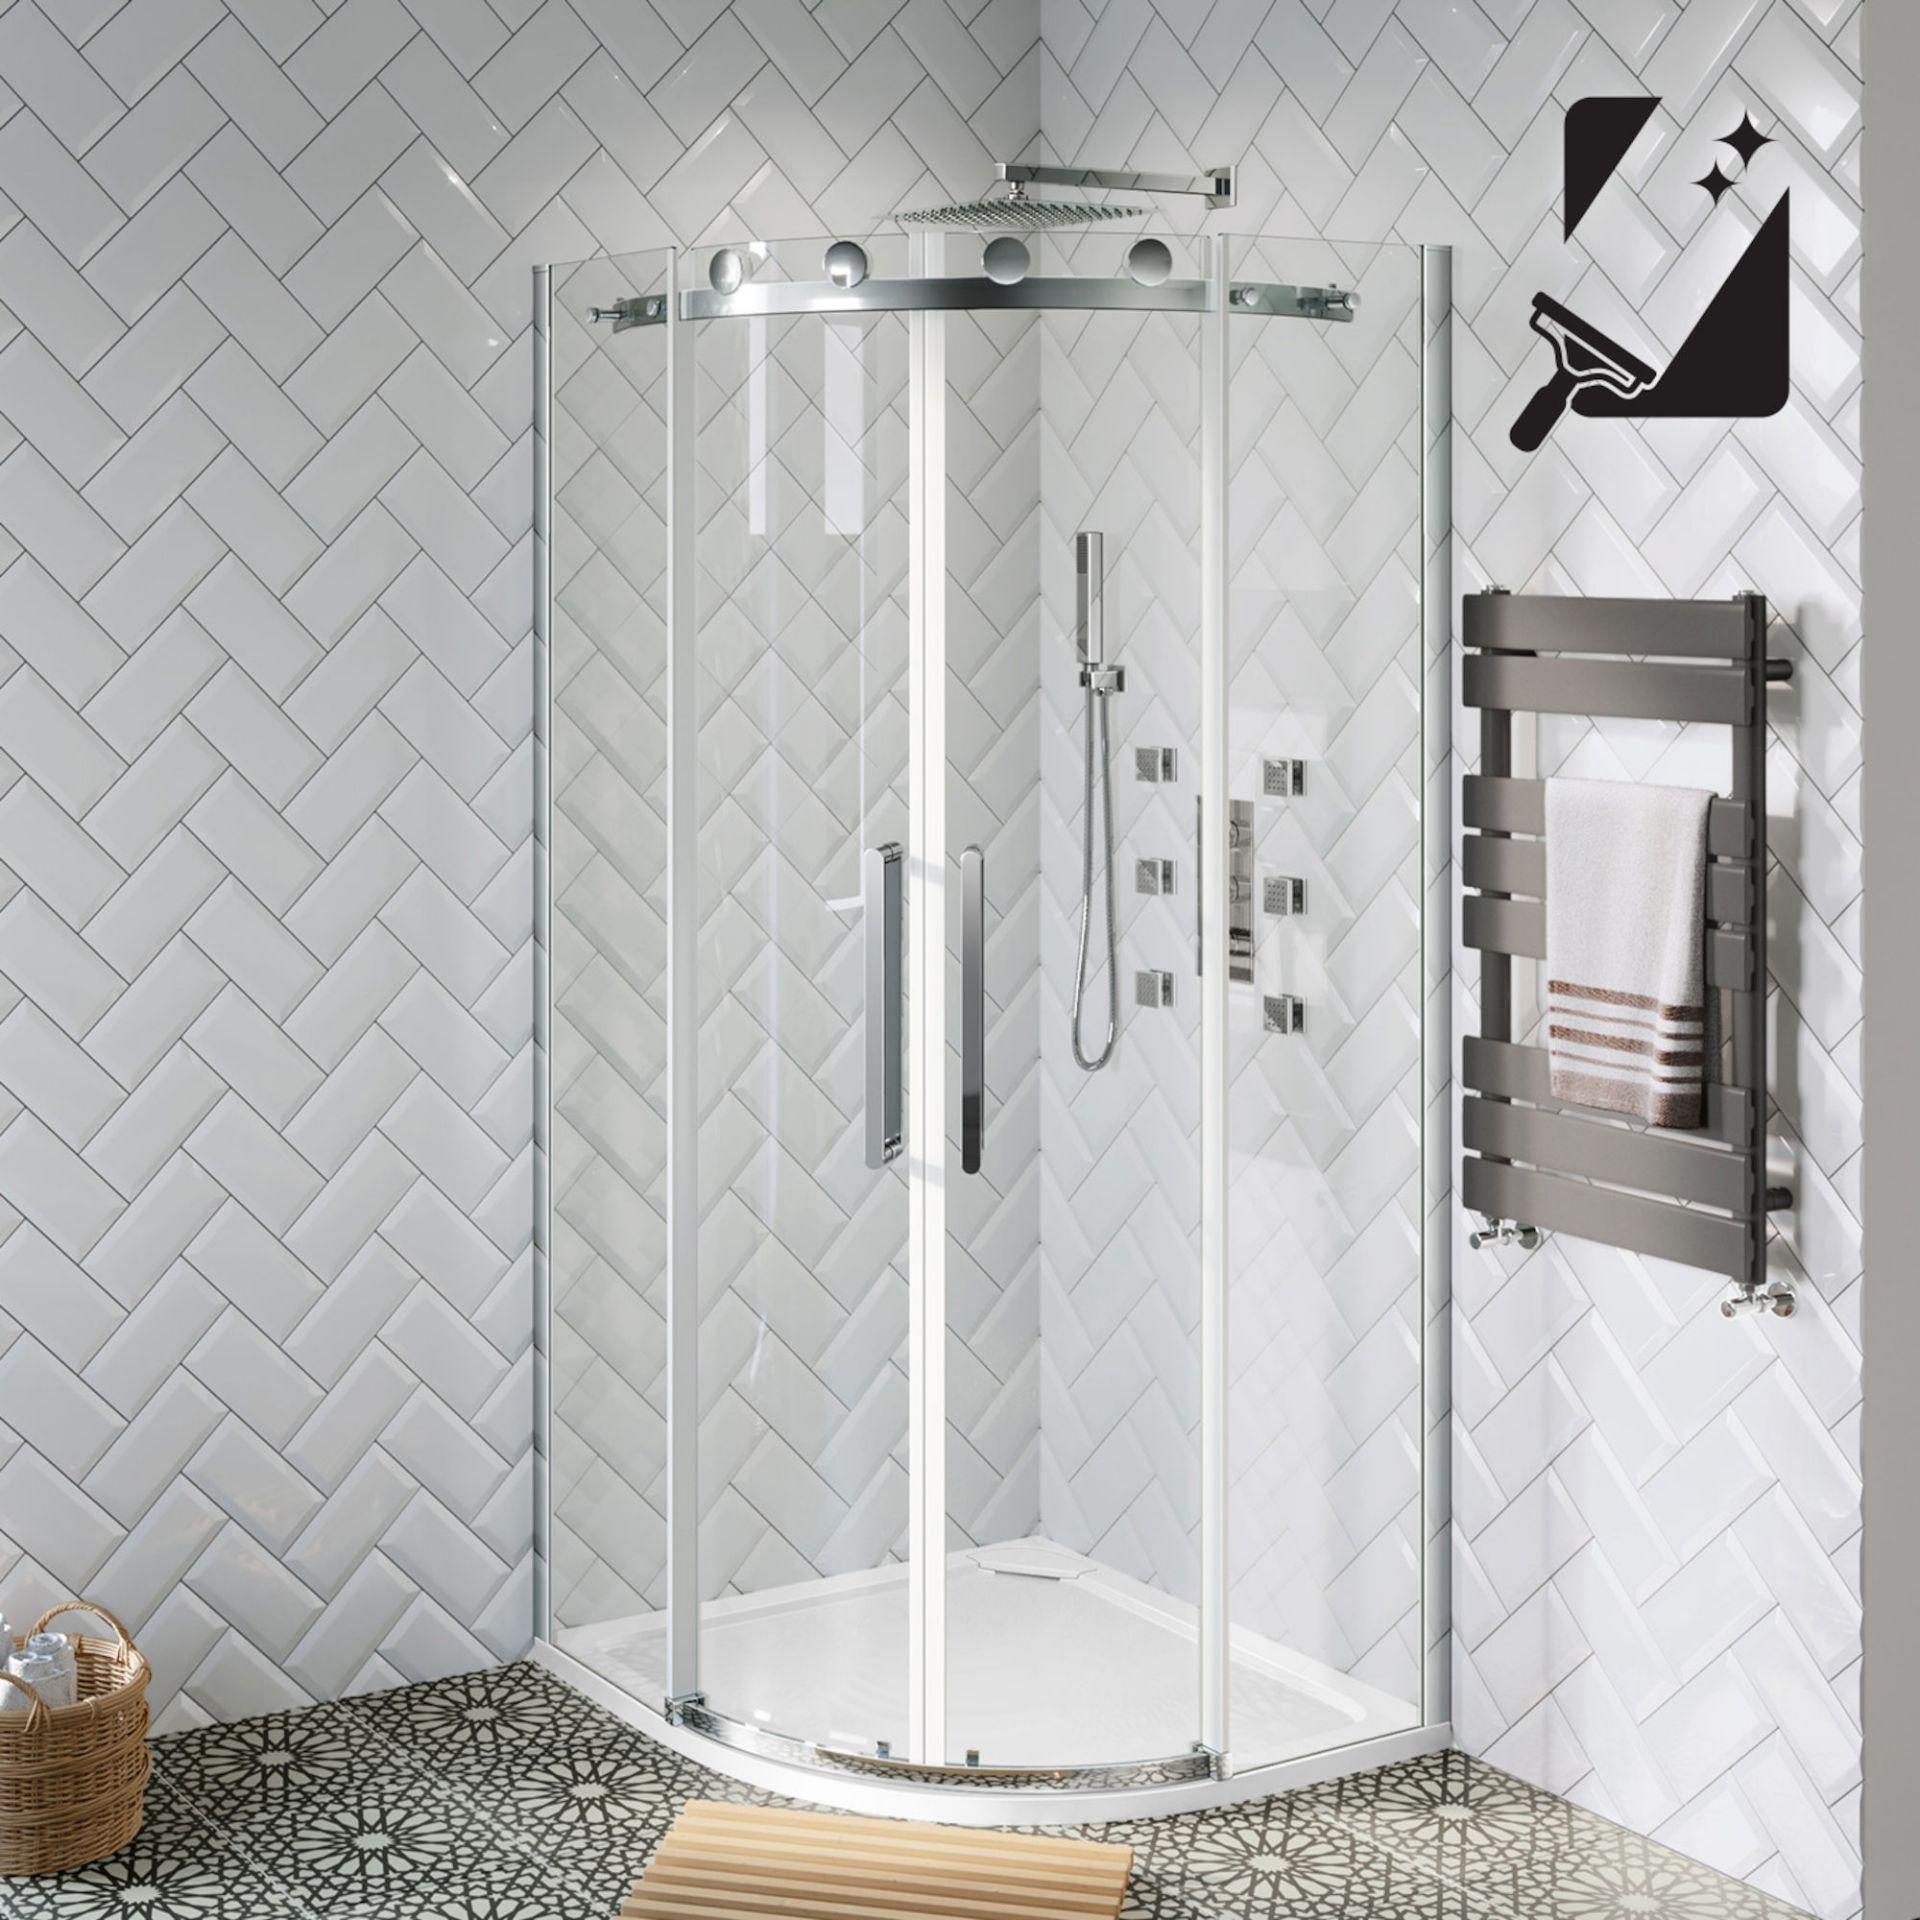 Lot 5 - (XX5) 1200x800mm - 10mm - Premium Frameless EasyClean Quadrant Shower Enclosure. RRP £649.99. ...